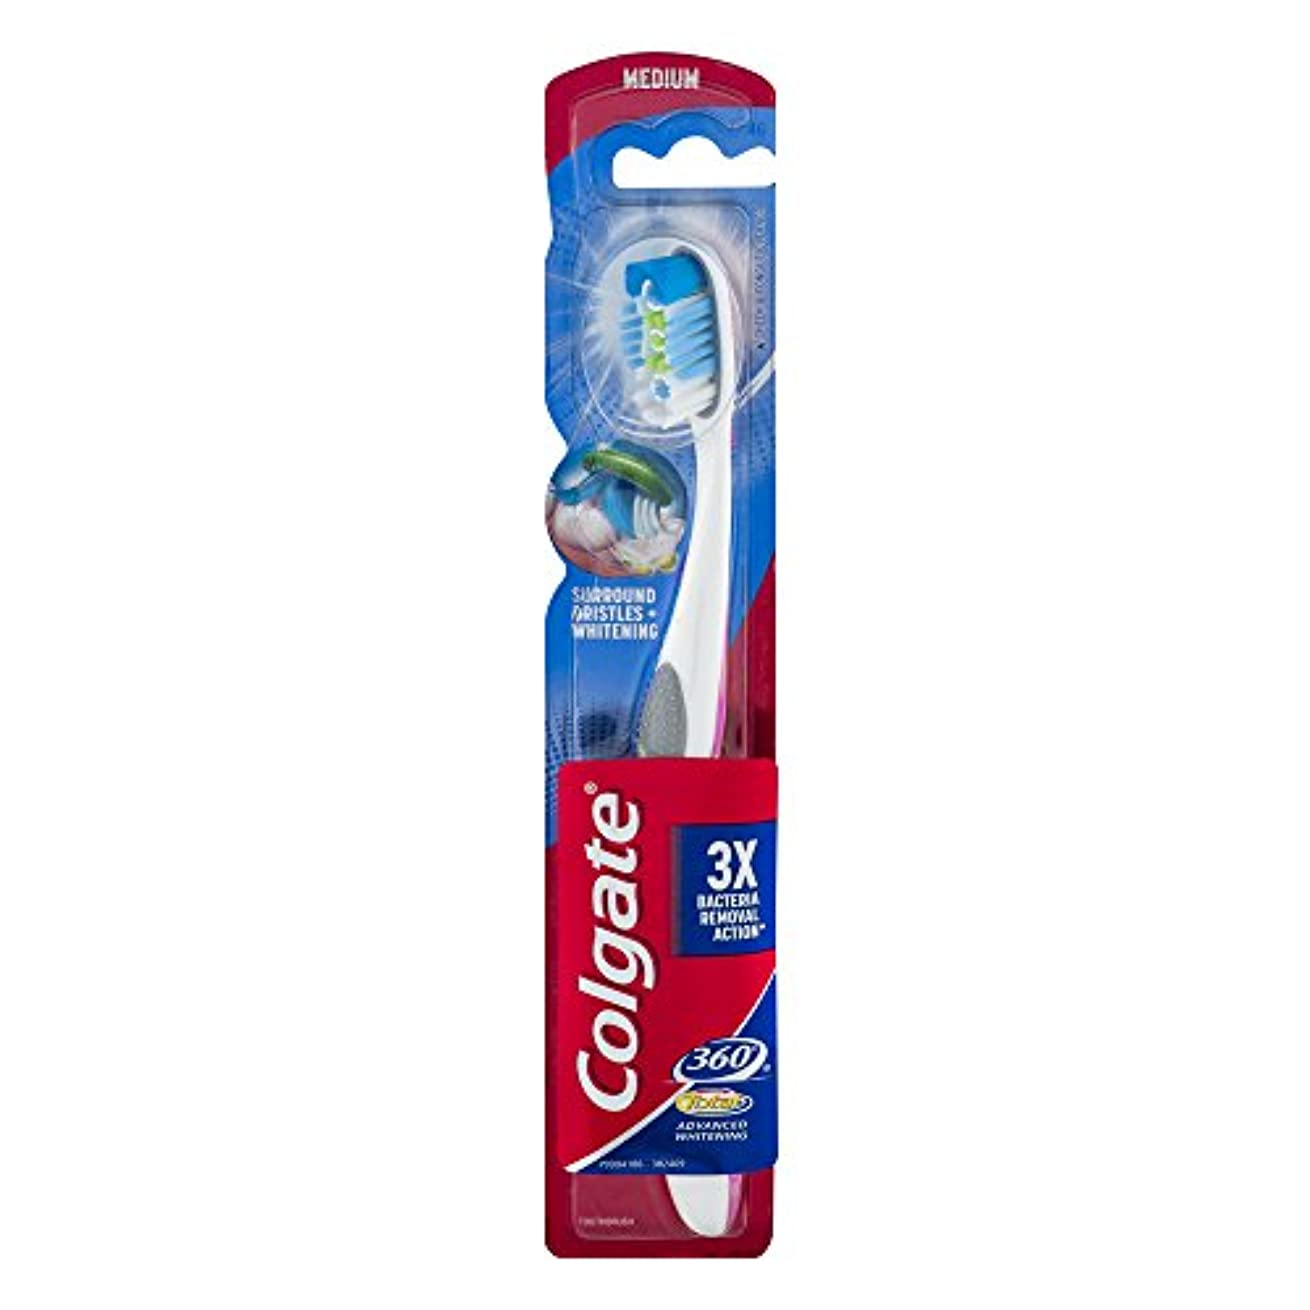 Colgate 360合計アドバンスト歯ブラシ完全な頭部ミディアム